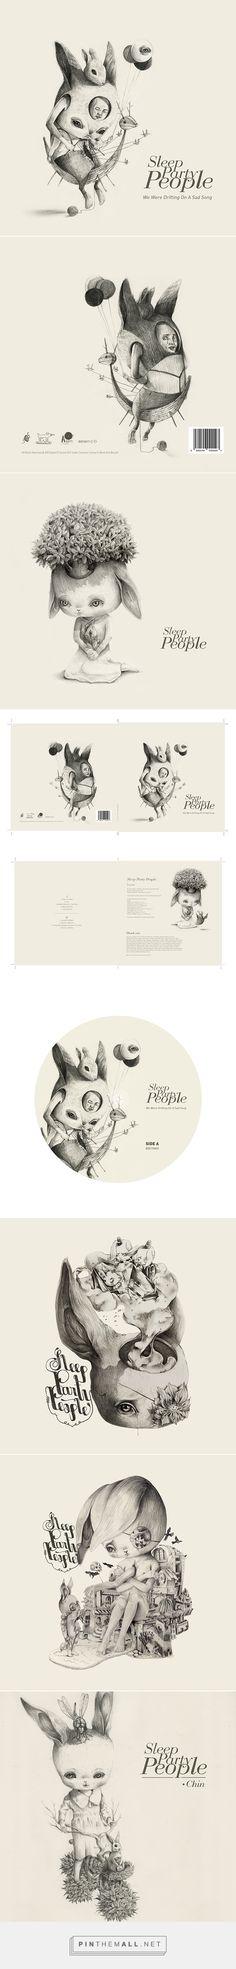 SLEEP PARTY PEOPLE'S NEW ALBUM COVER on Behance - https://www.behance.net/gallery/3421281/SLEEP-PARTY-PEOPLES-NEW-ALBUM-COVER